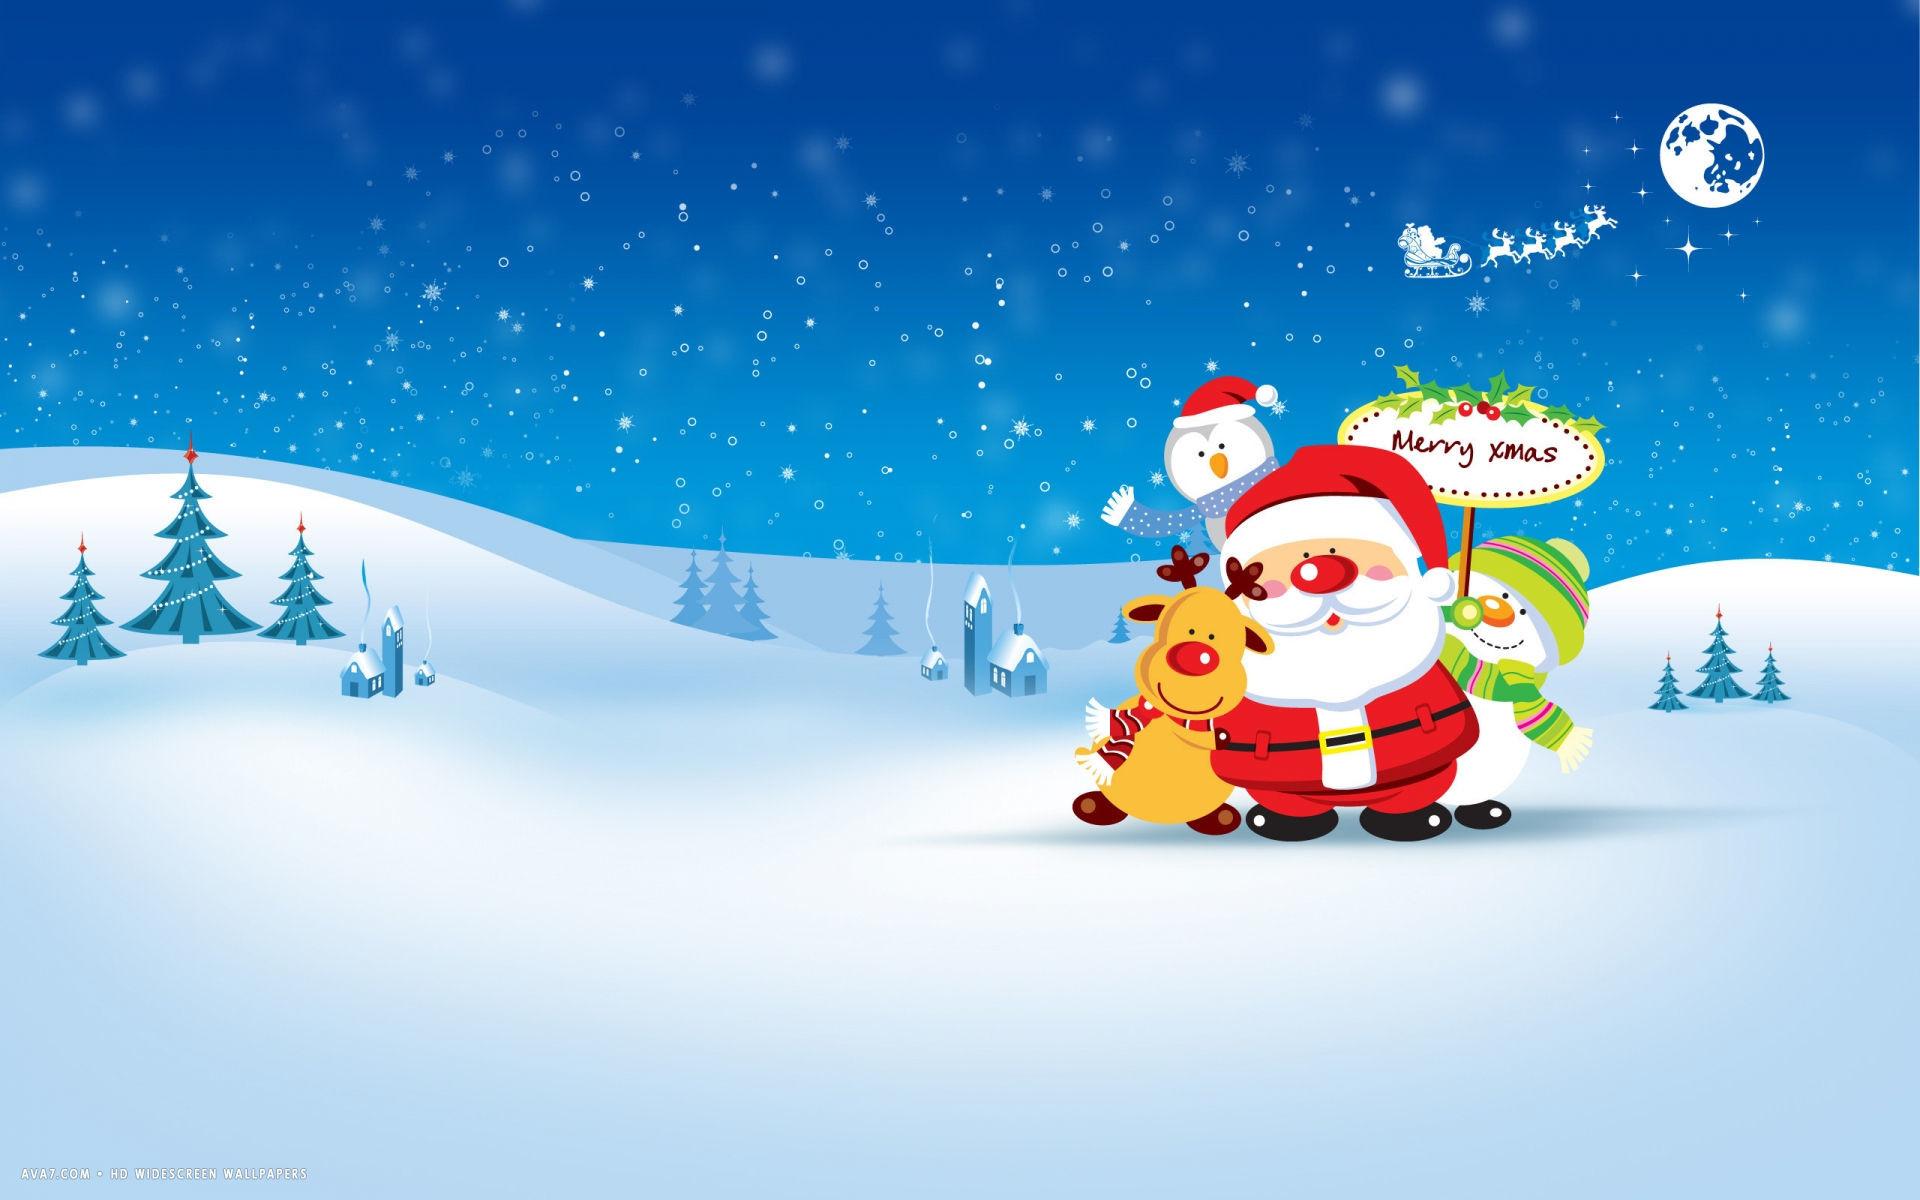 Res: 1920x1200, merry xmas christmas landscape vector santa rudolph snowman holiday hd  widescreen wallpaper